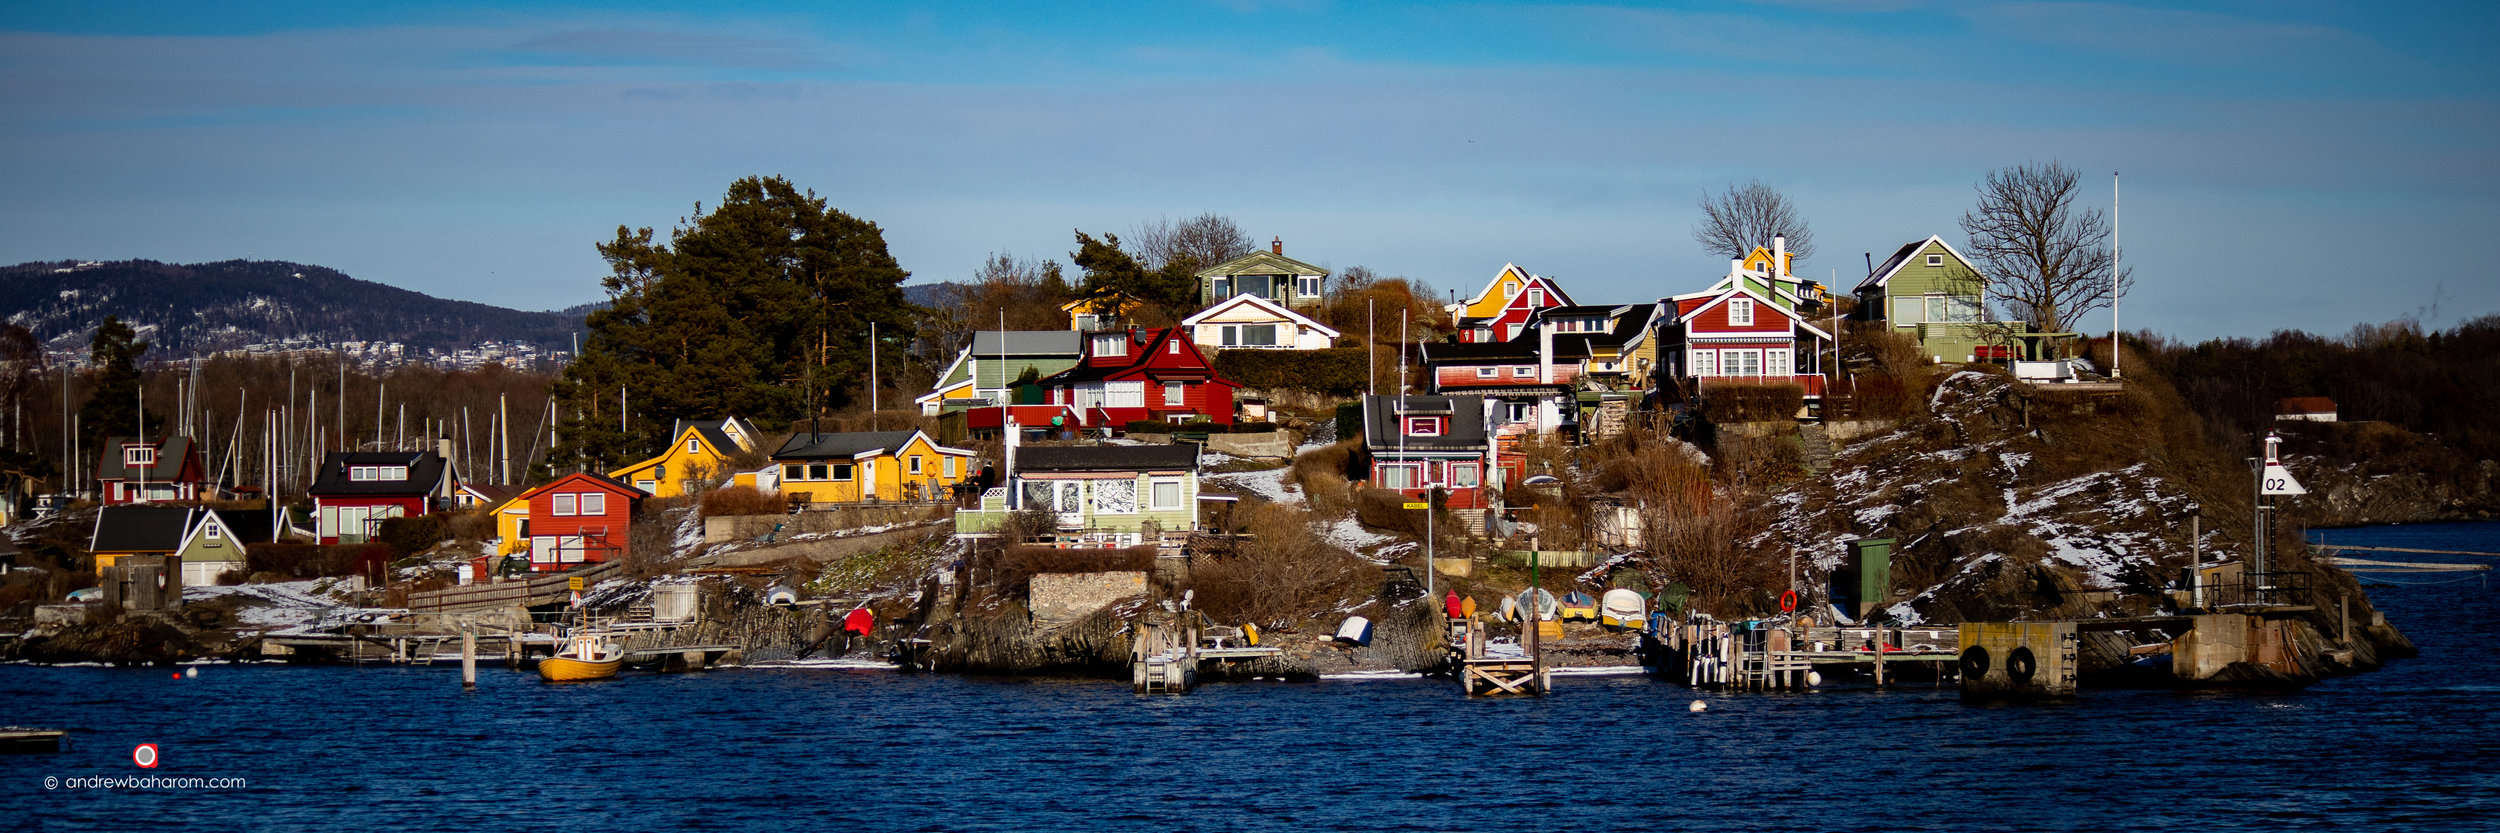 Island Houses.jpg